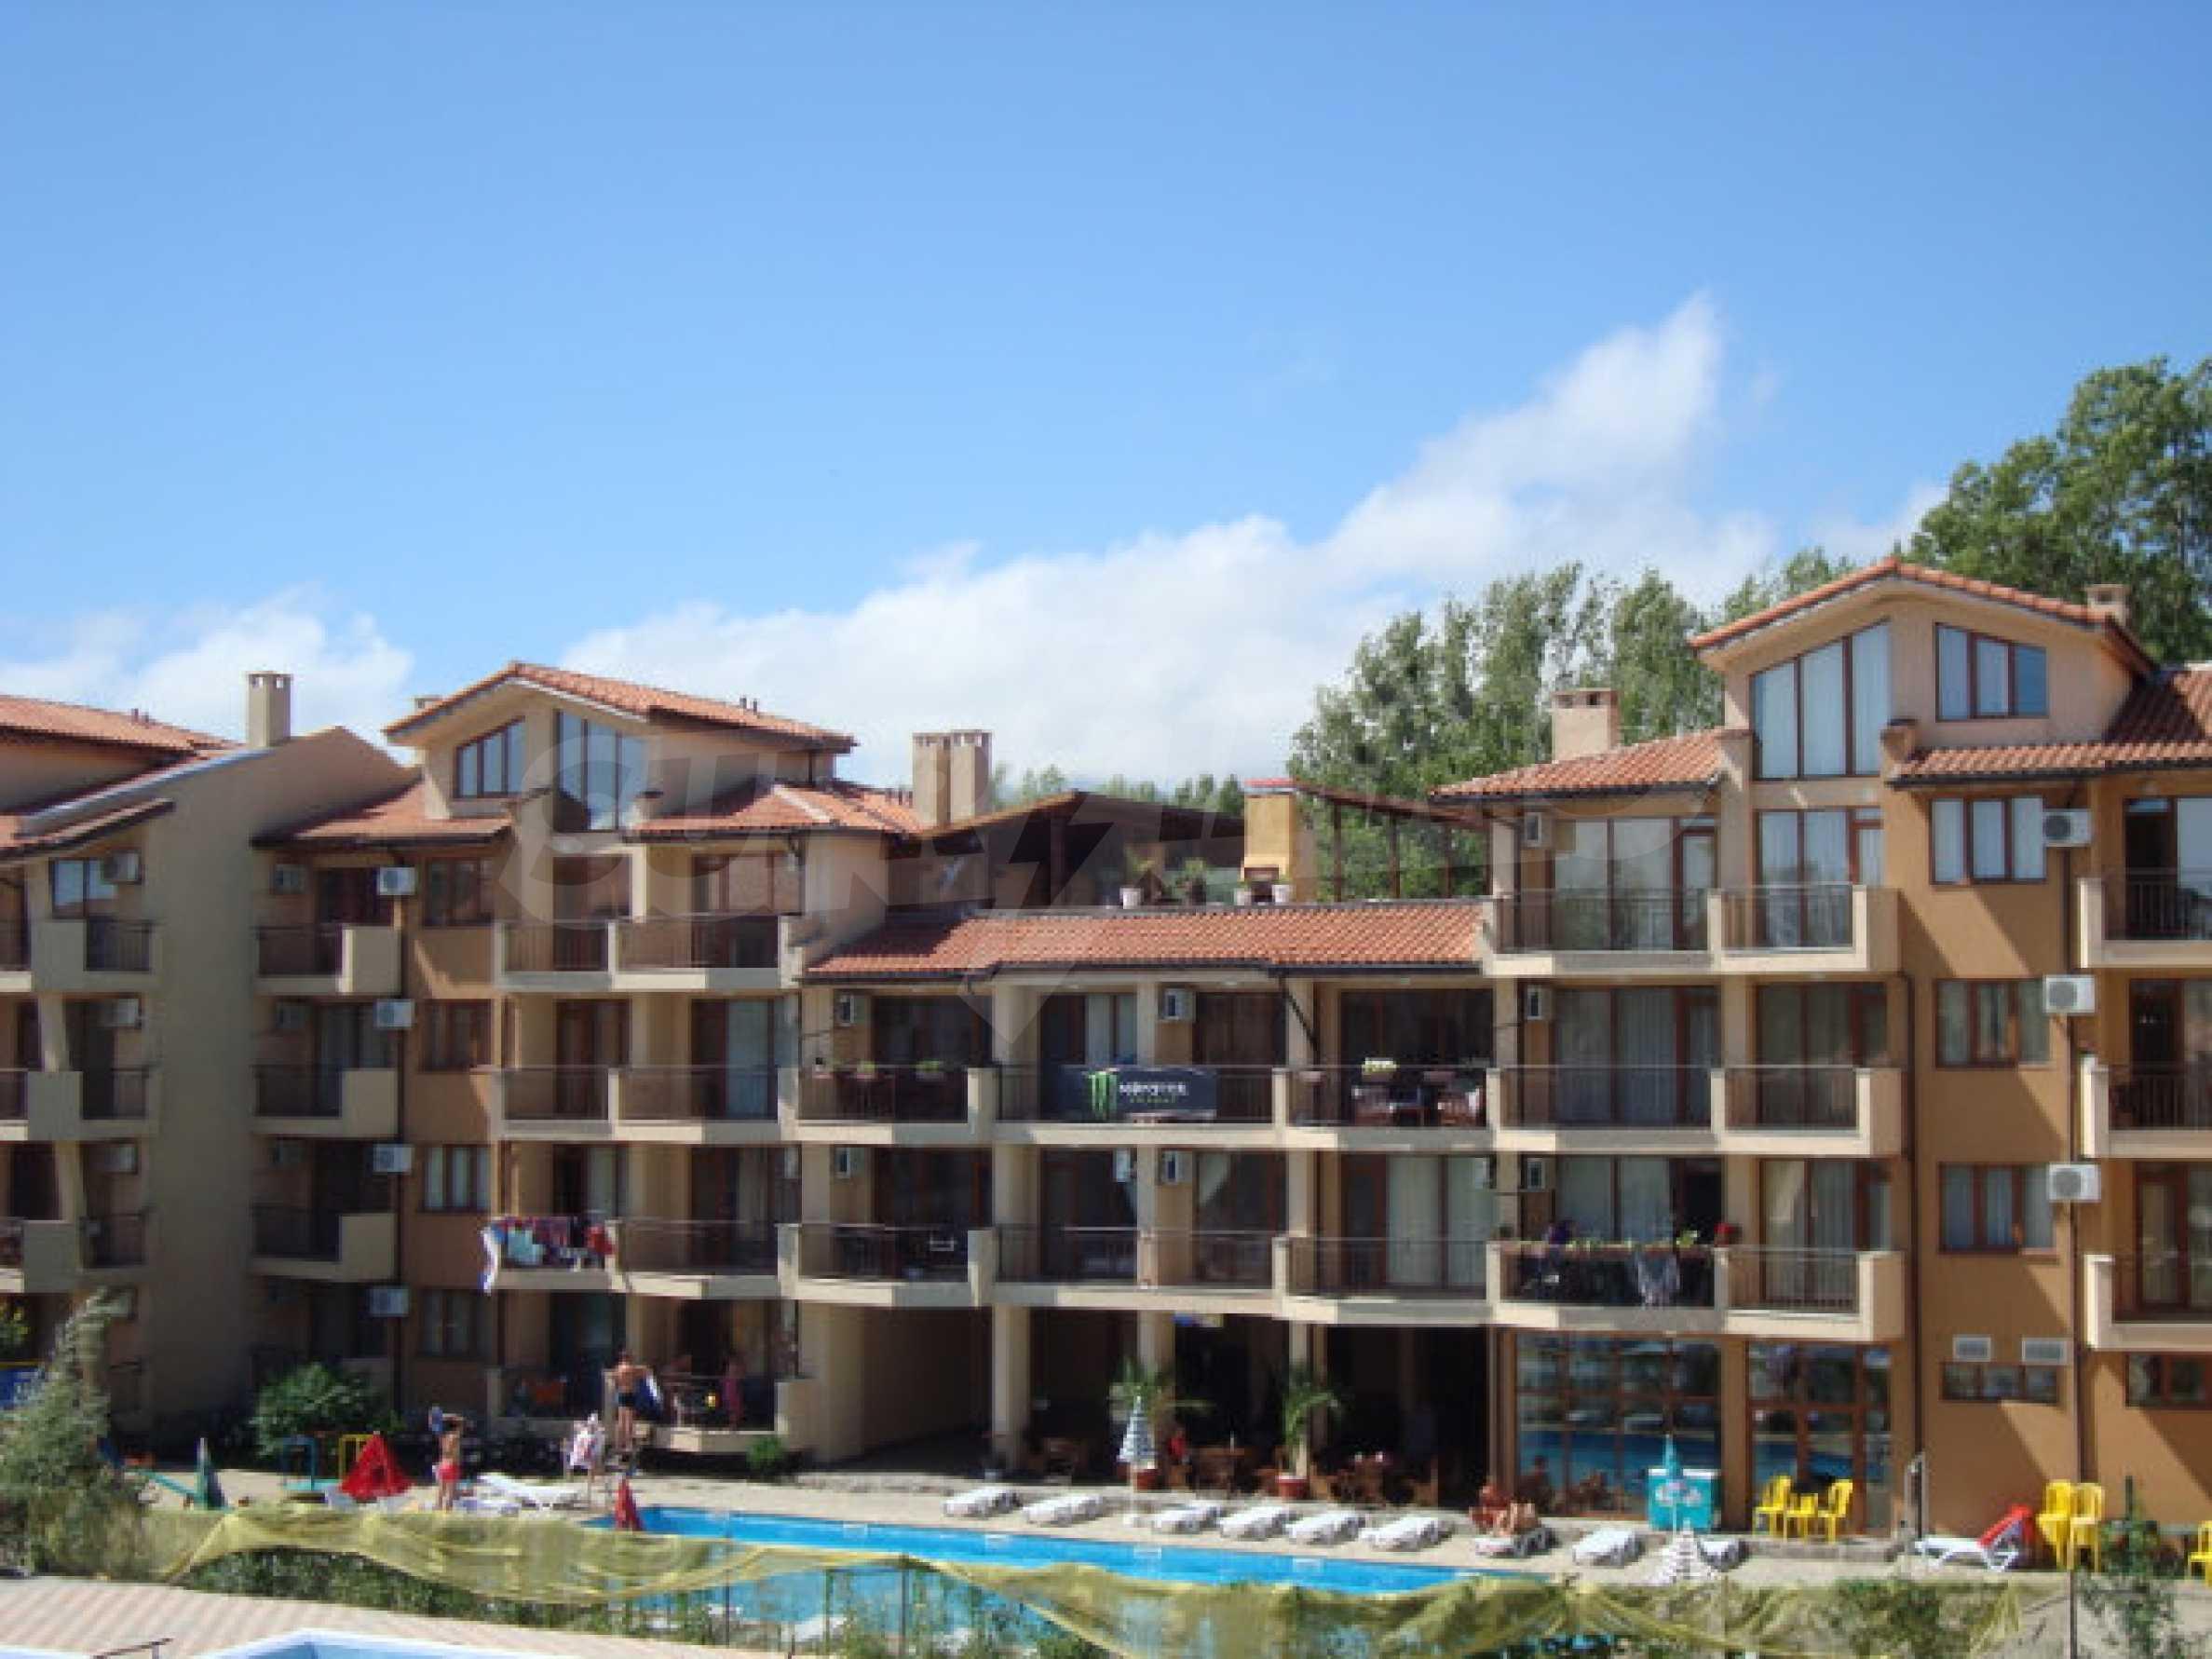 Studios und Apartments im Nestinarka-Komplex in Tsarevo 1